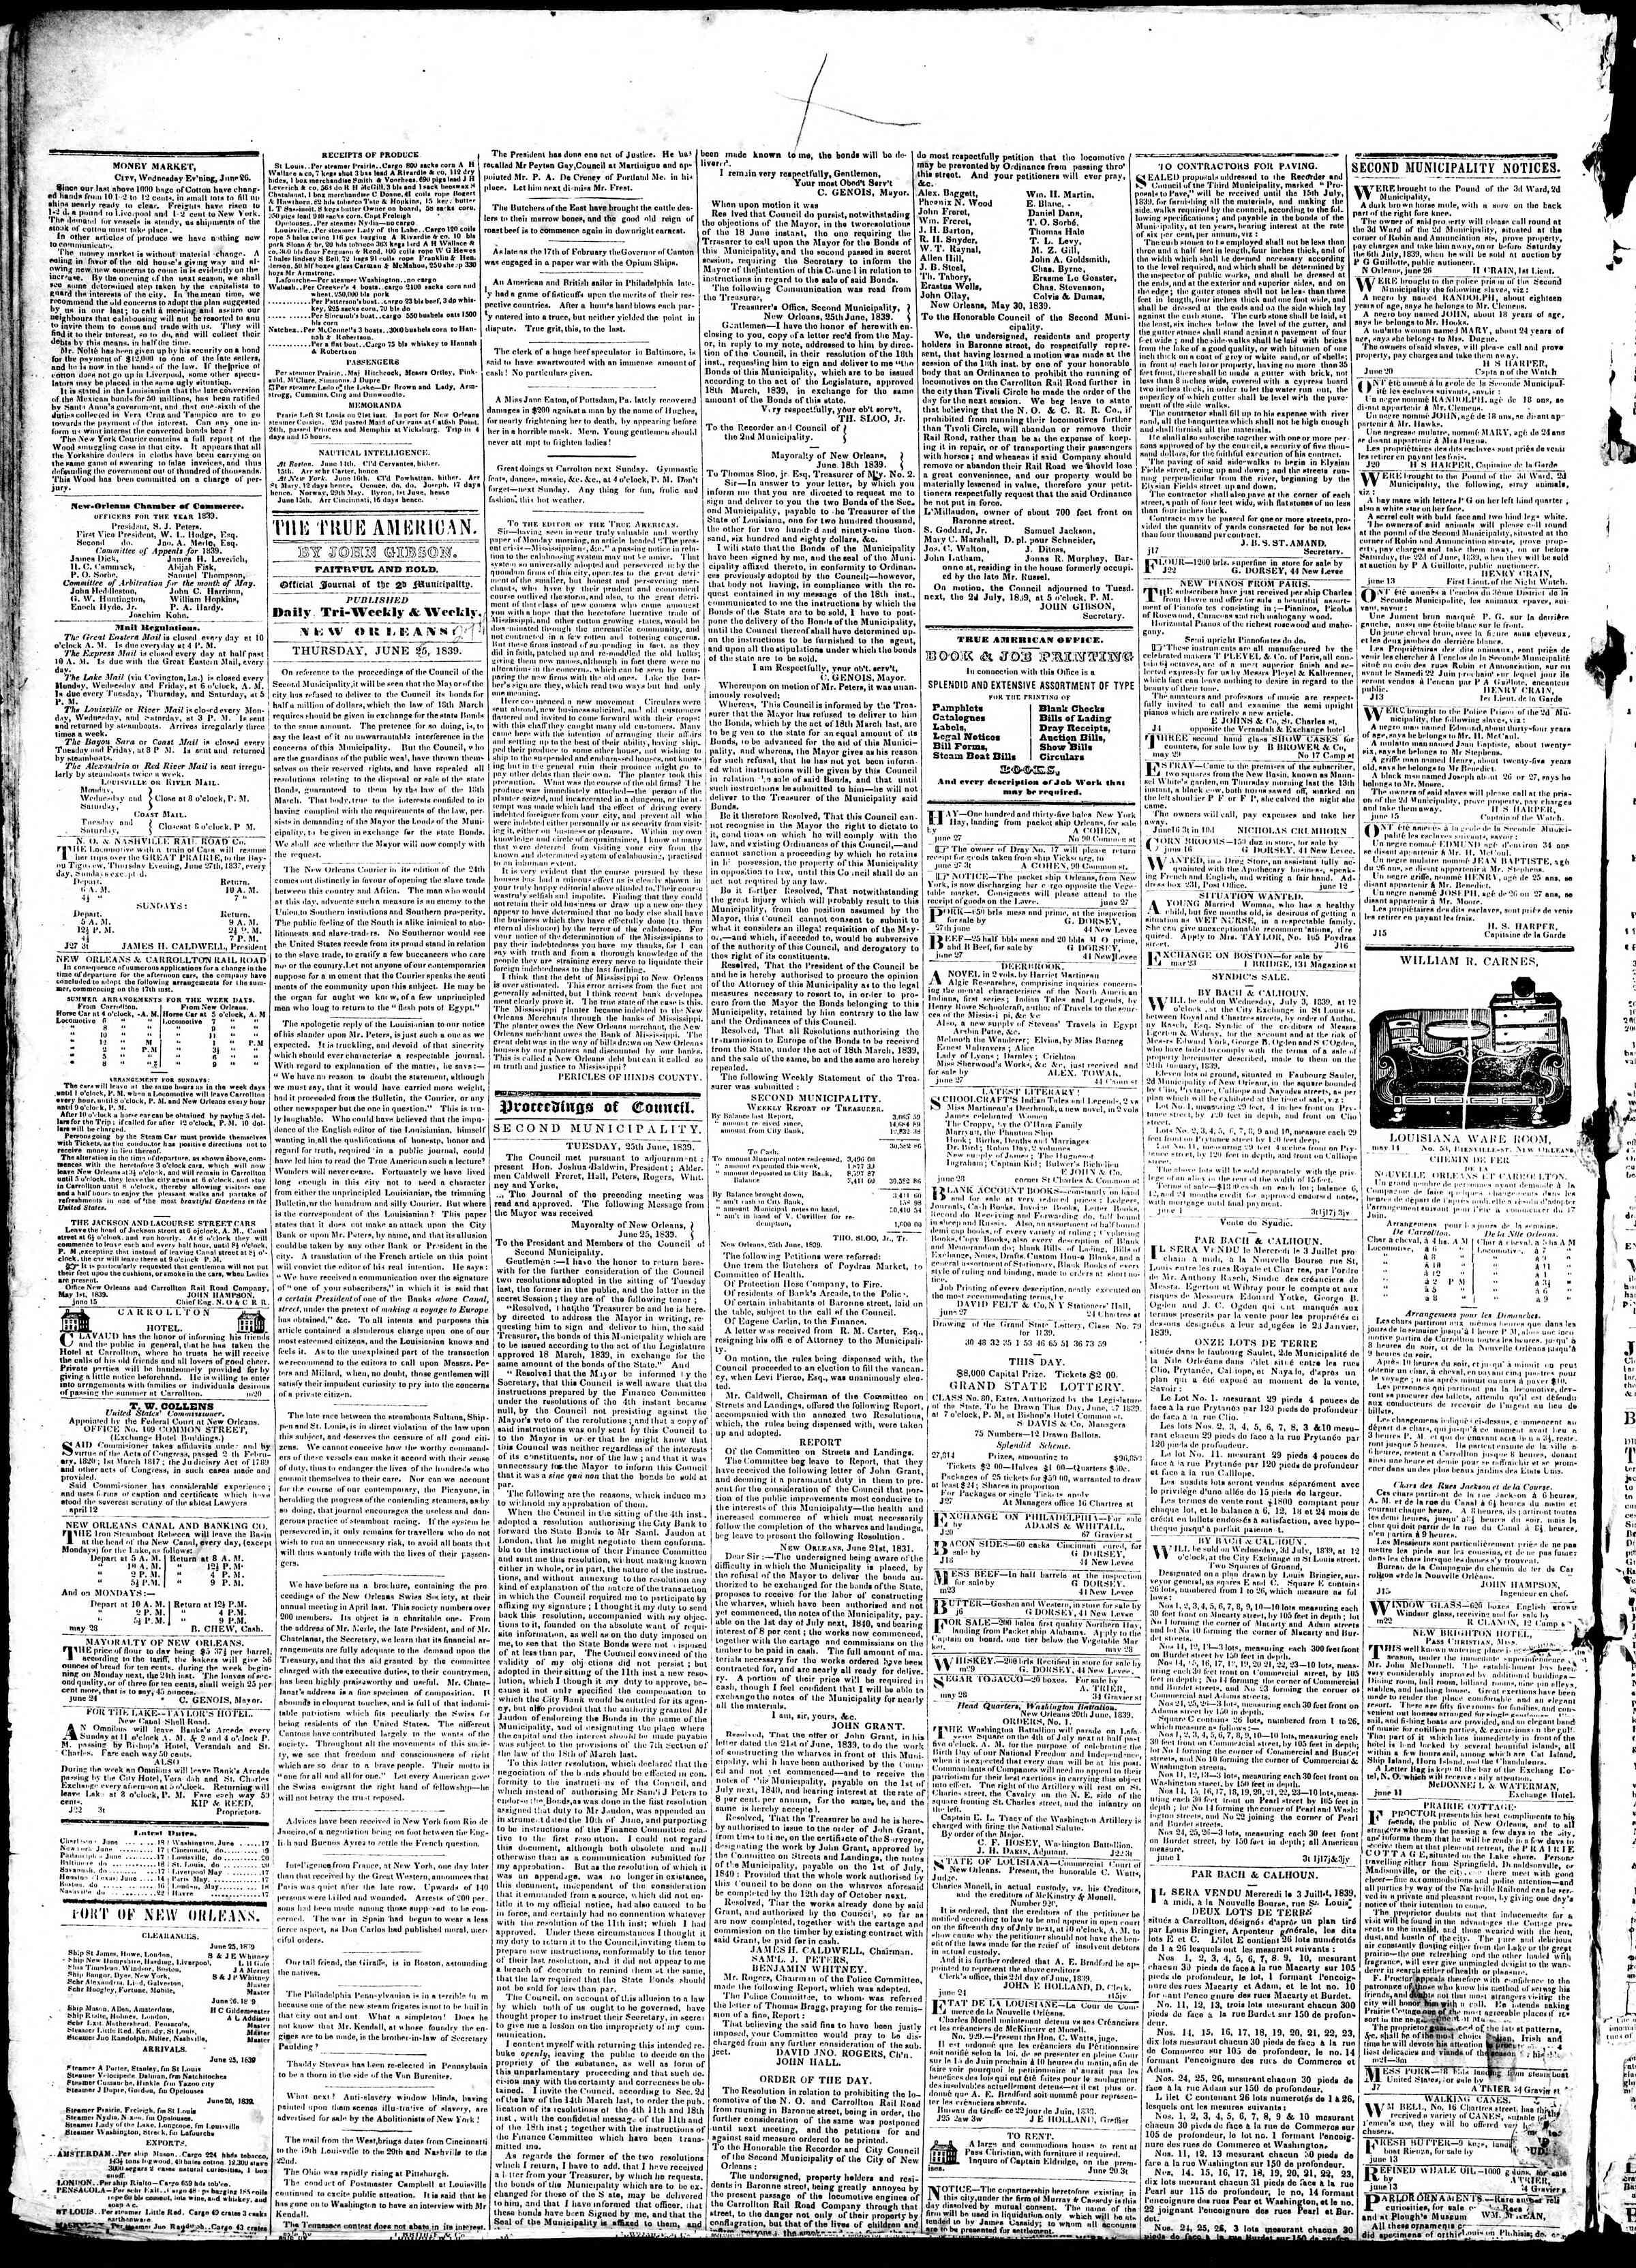 June 27, 1839 Tarihli True American Gazetesi Sayfa 2